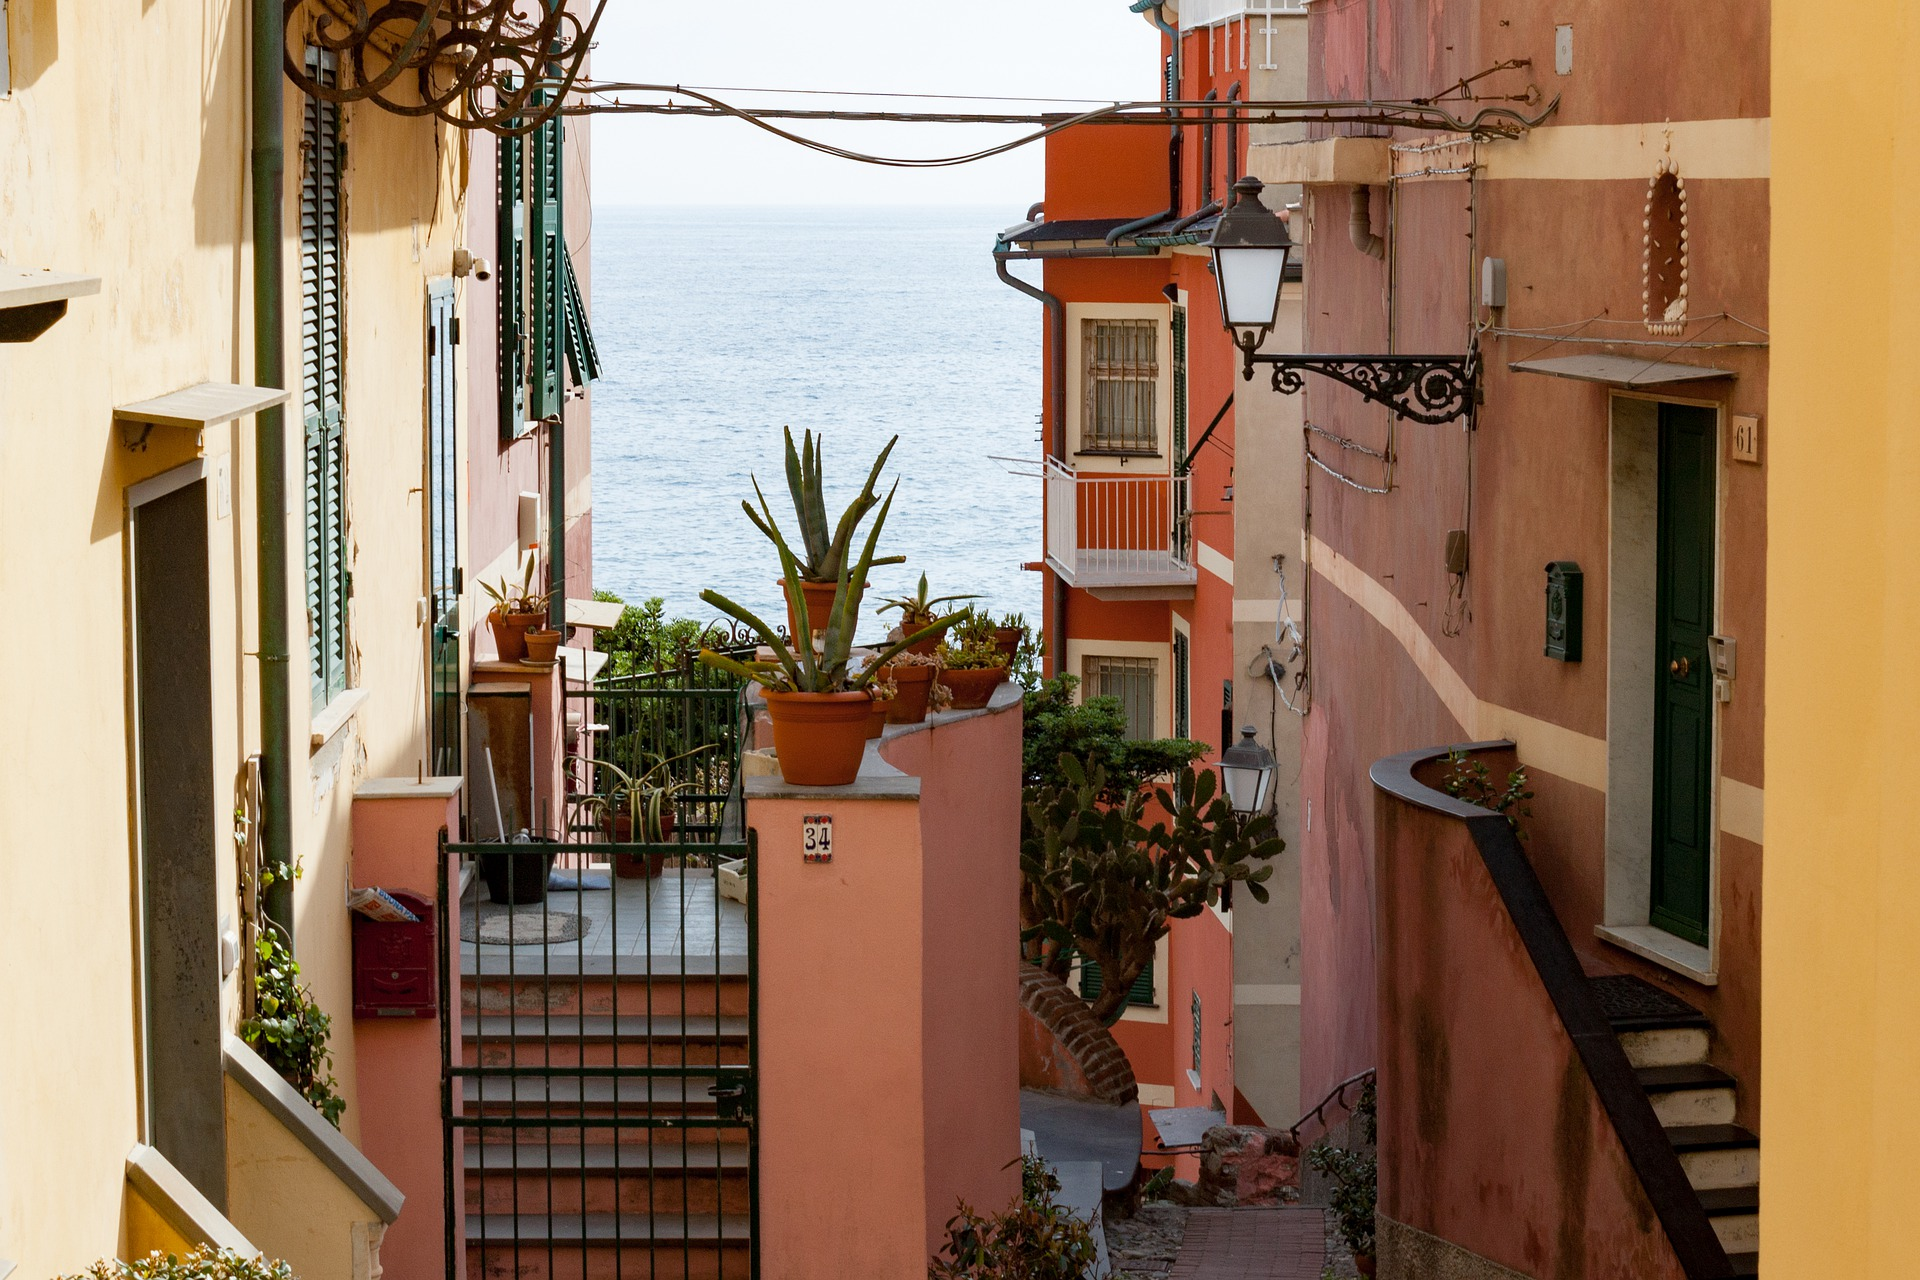 Voli economici per Genova